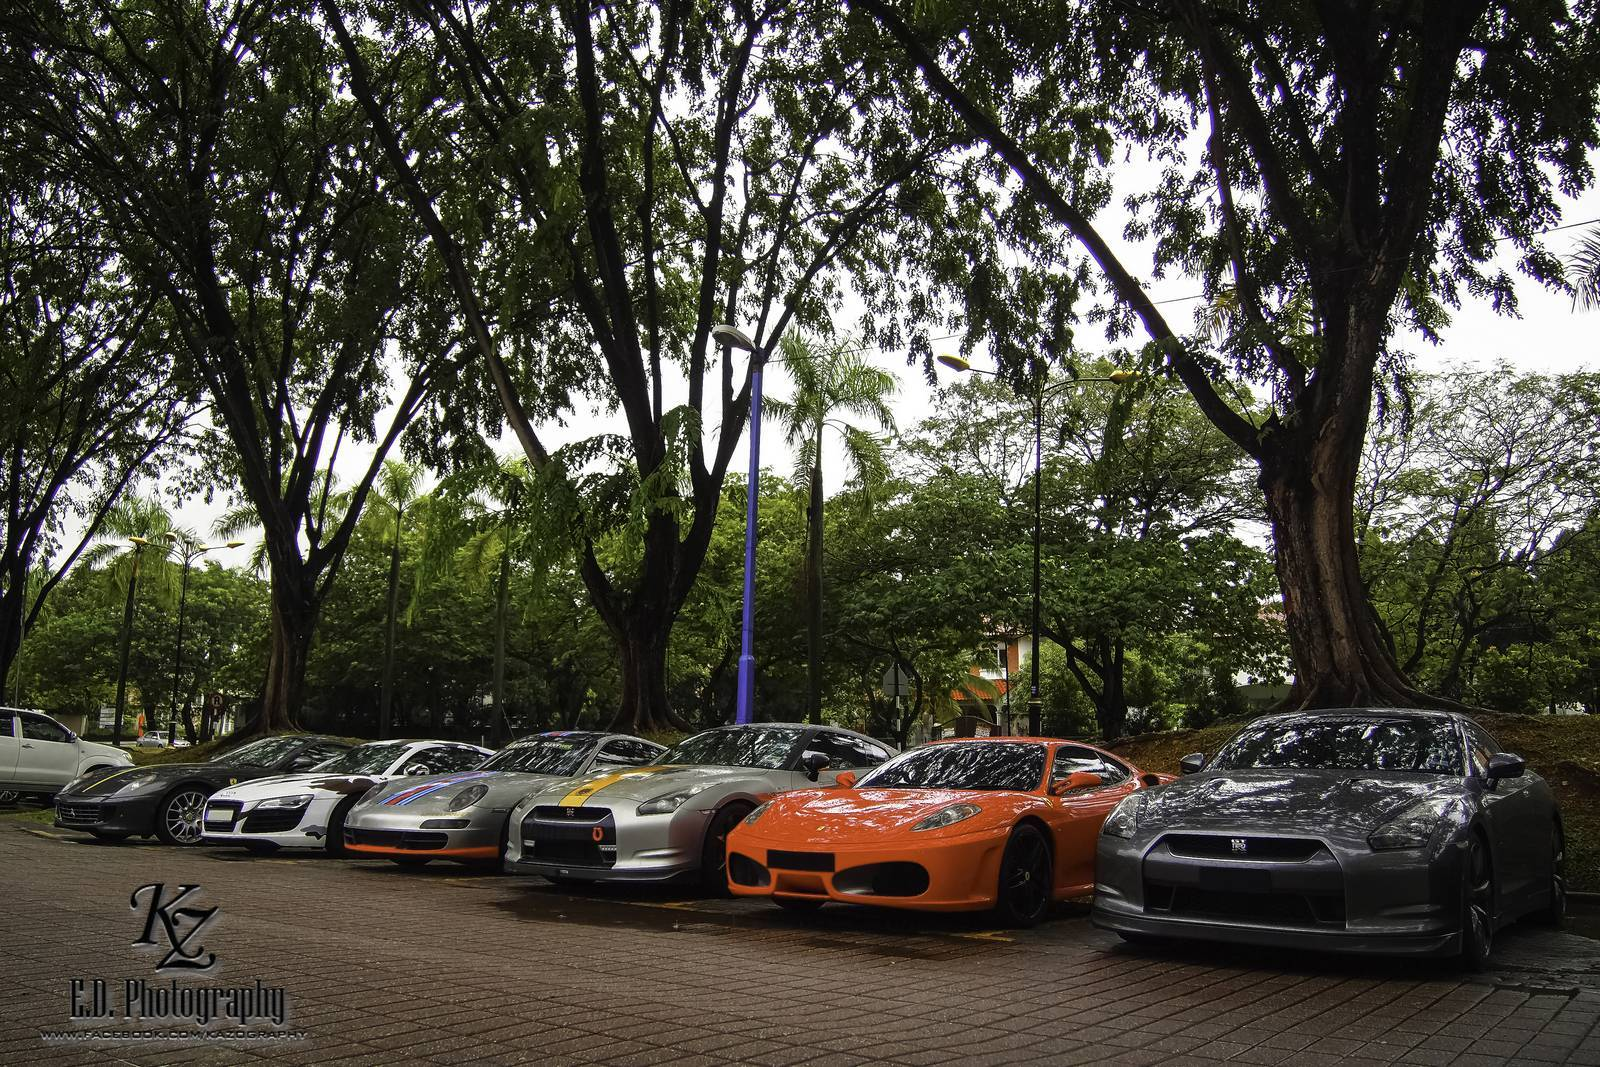 Gallery: Blue Jackets Society Supercar Charity Drive Malaysia